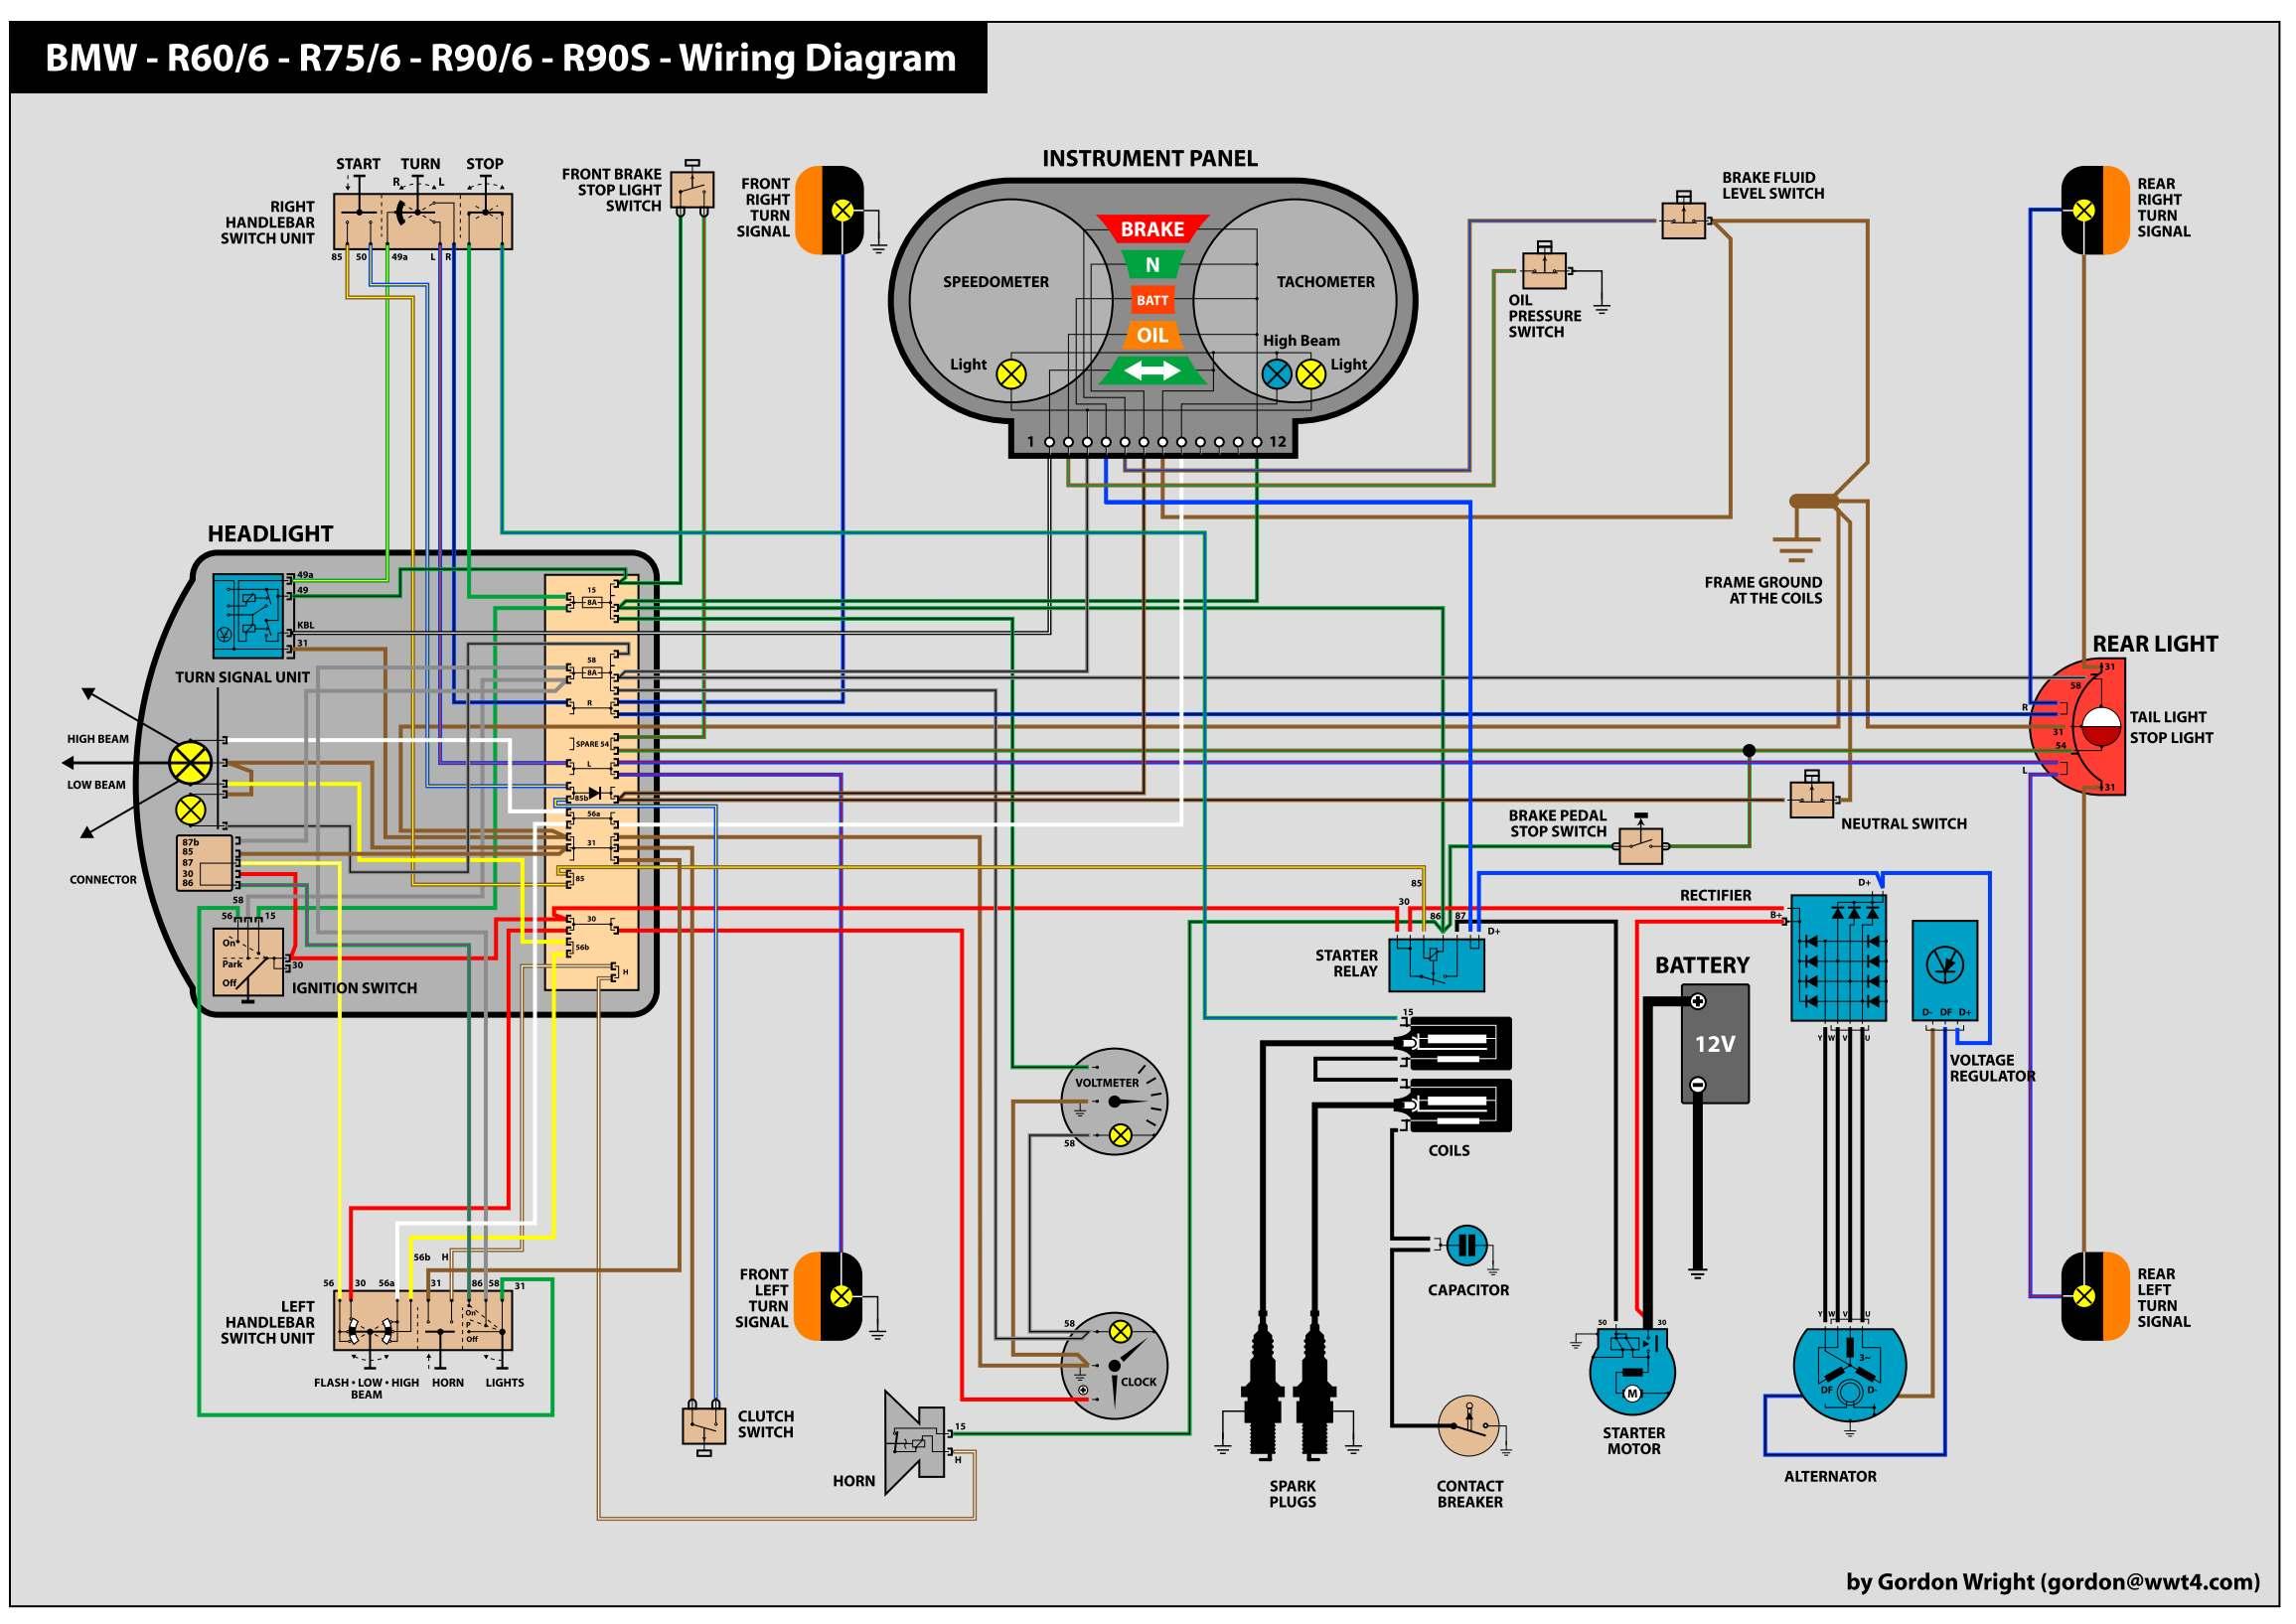 Bmw X1 Trailer Wiring Diagram - Jeep Wiring Diagram Wrangler for Wiring  Diagram Schematics | X1 Wiring Diagram |  | Wiring Diagram Schematics